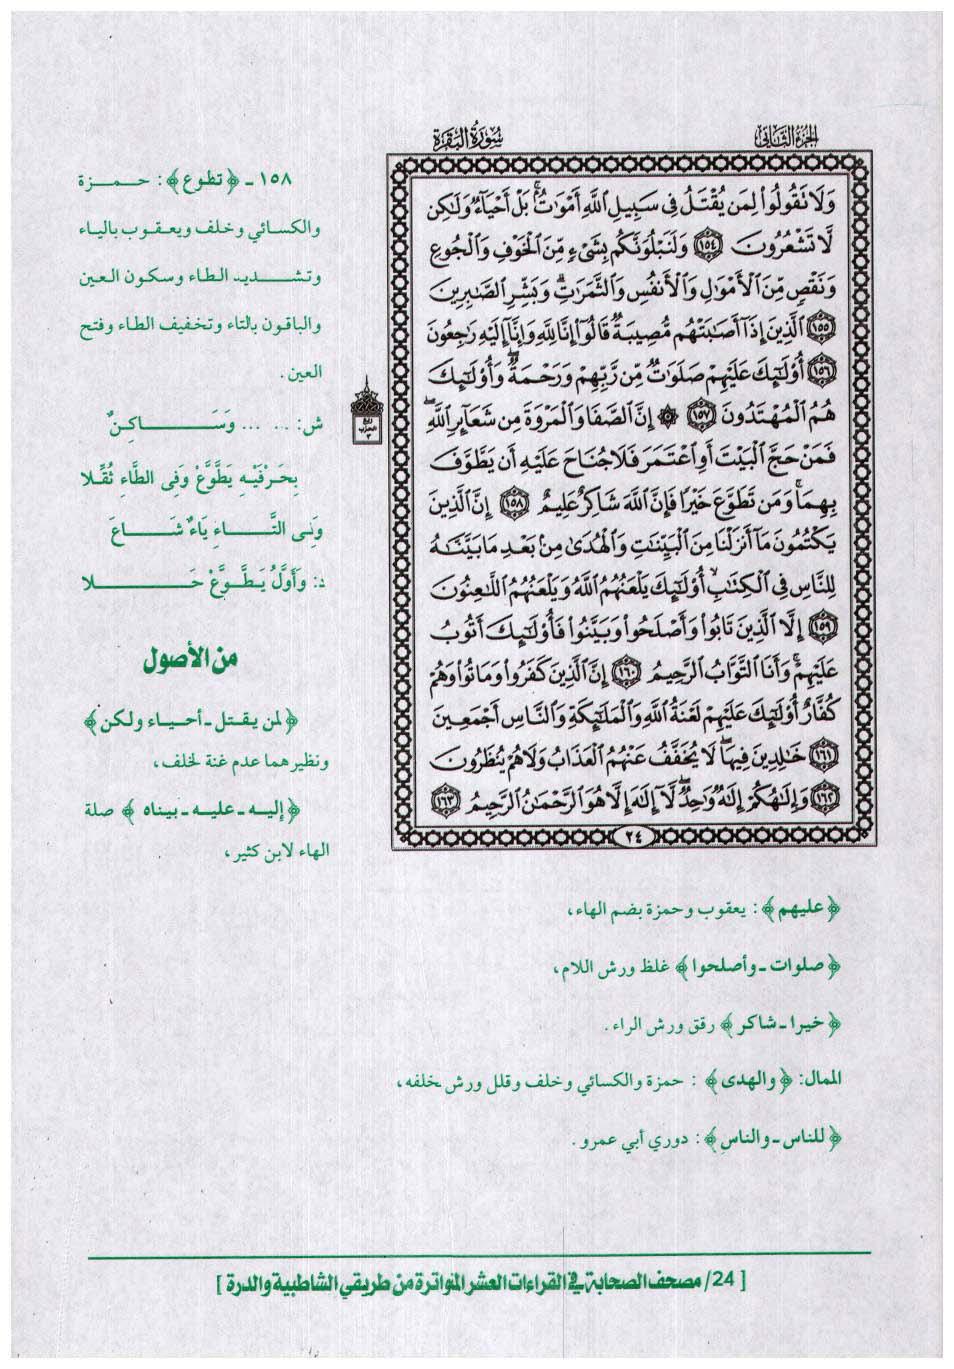 Pin By القران الكريم The Holy Quran On مصحف الصحابة في القراءات العشر المتواترة من طريق الشاطبية والدرة Bullet Journal Journal